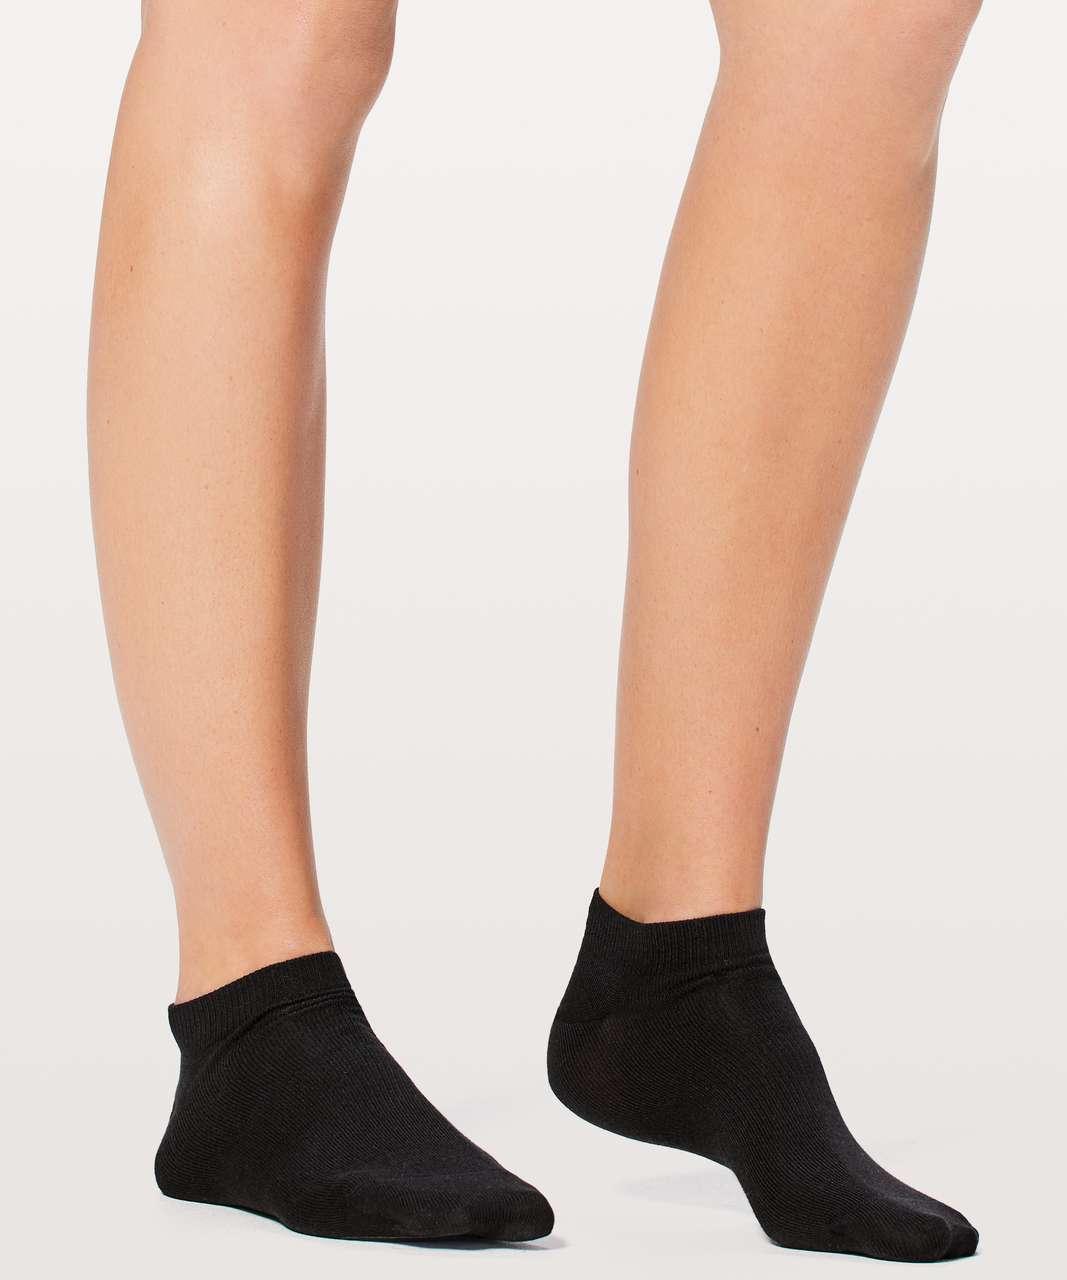 Lululemon All In A Day Sock - Black